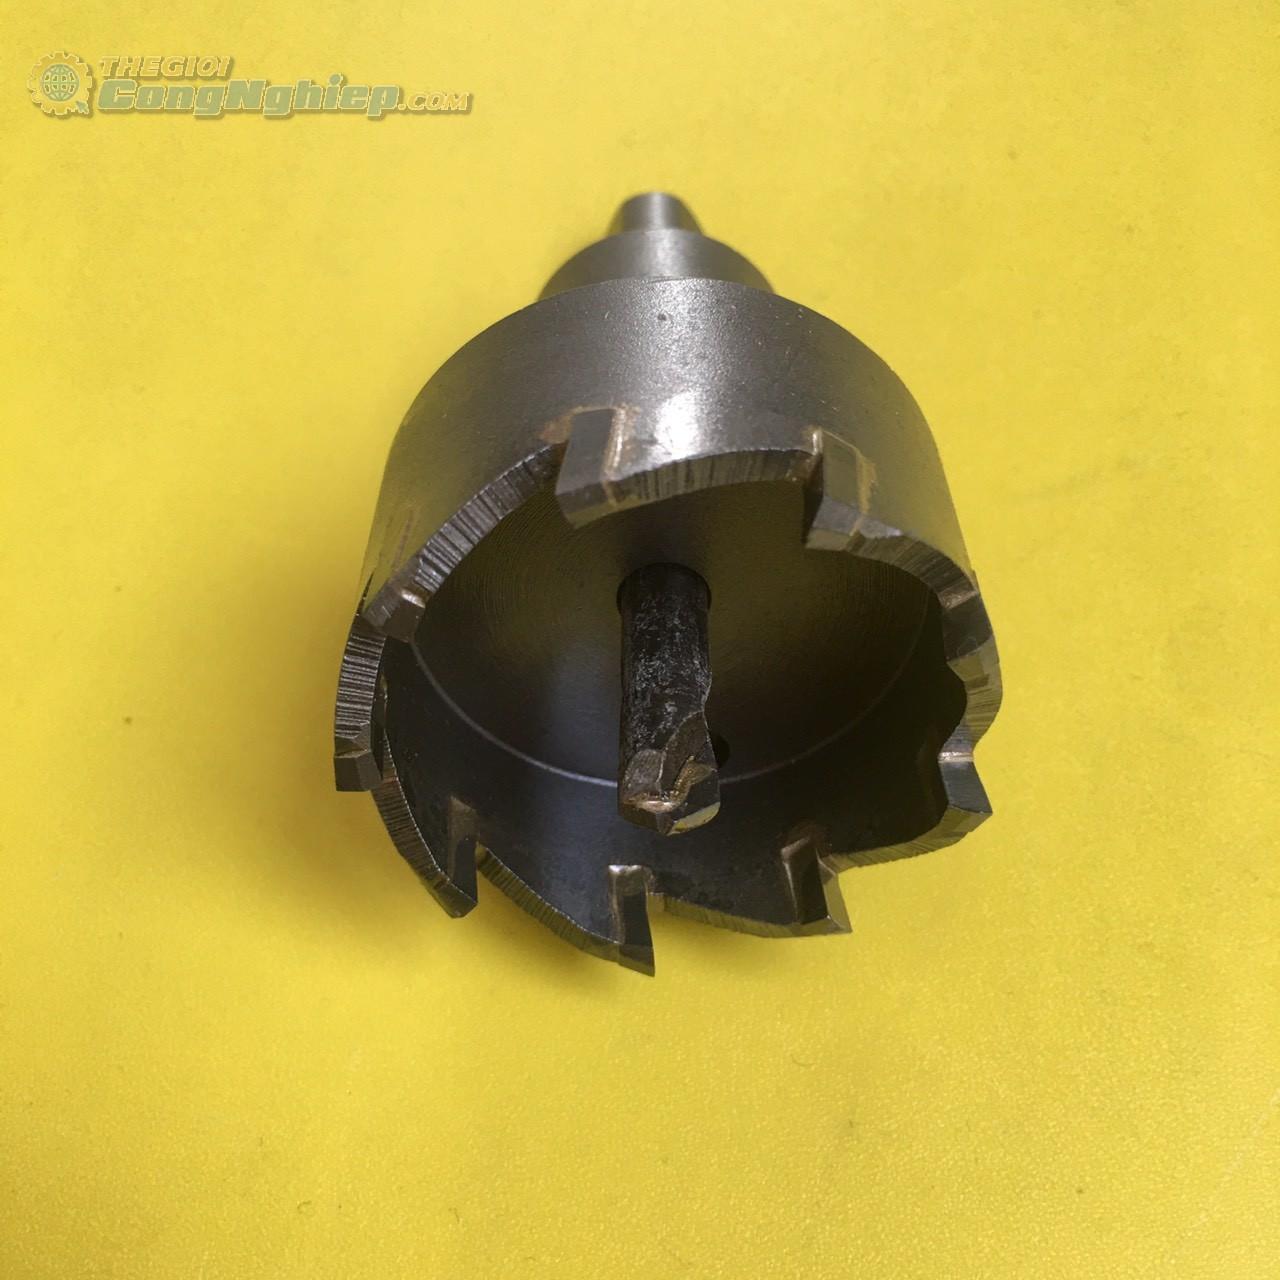 Iron nose TGCN-50539 THANGLOI